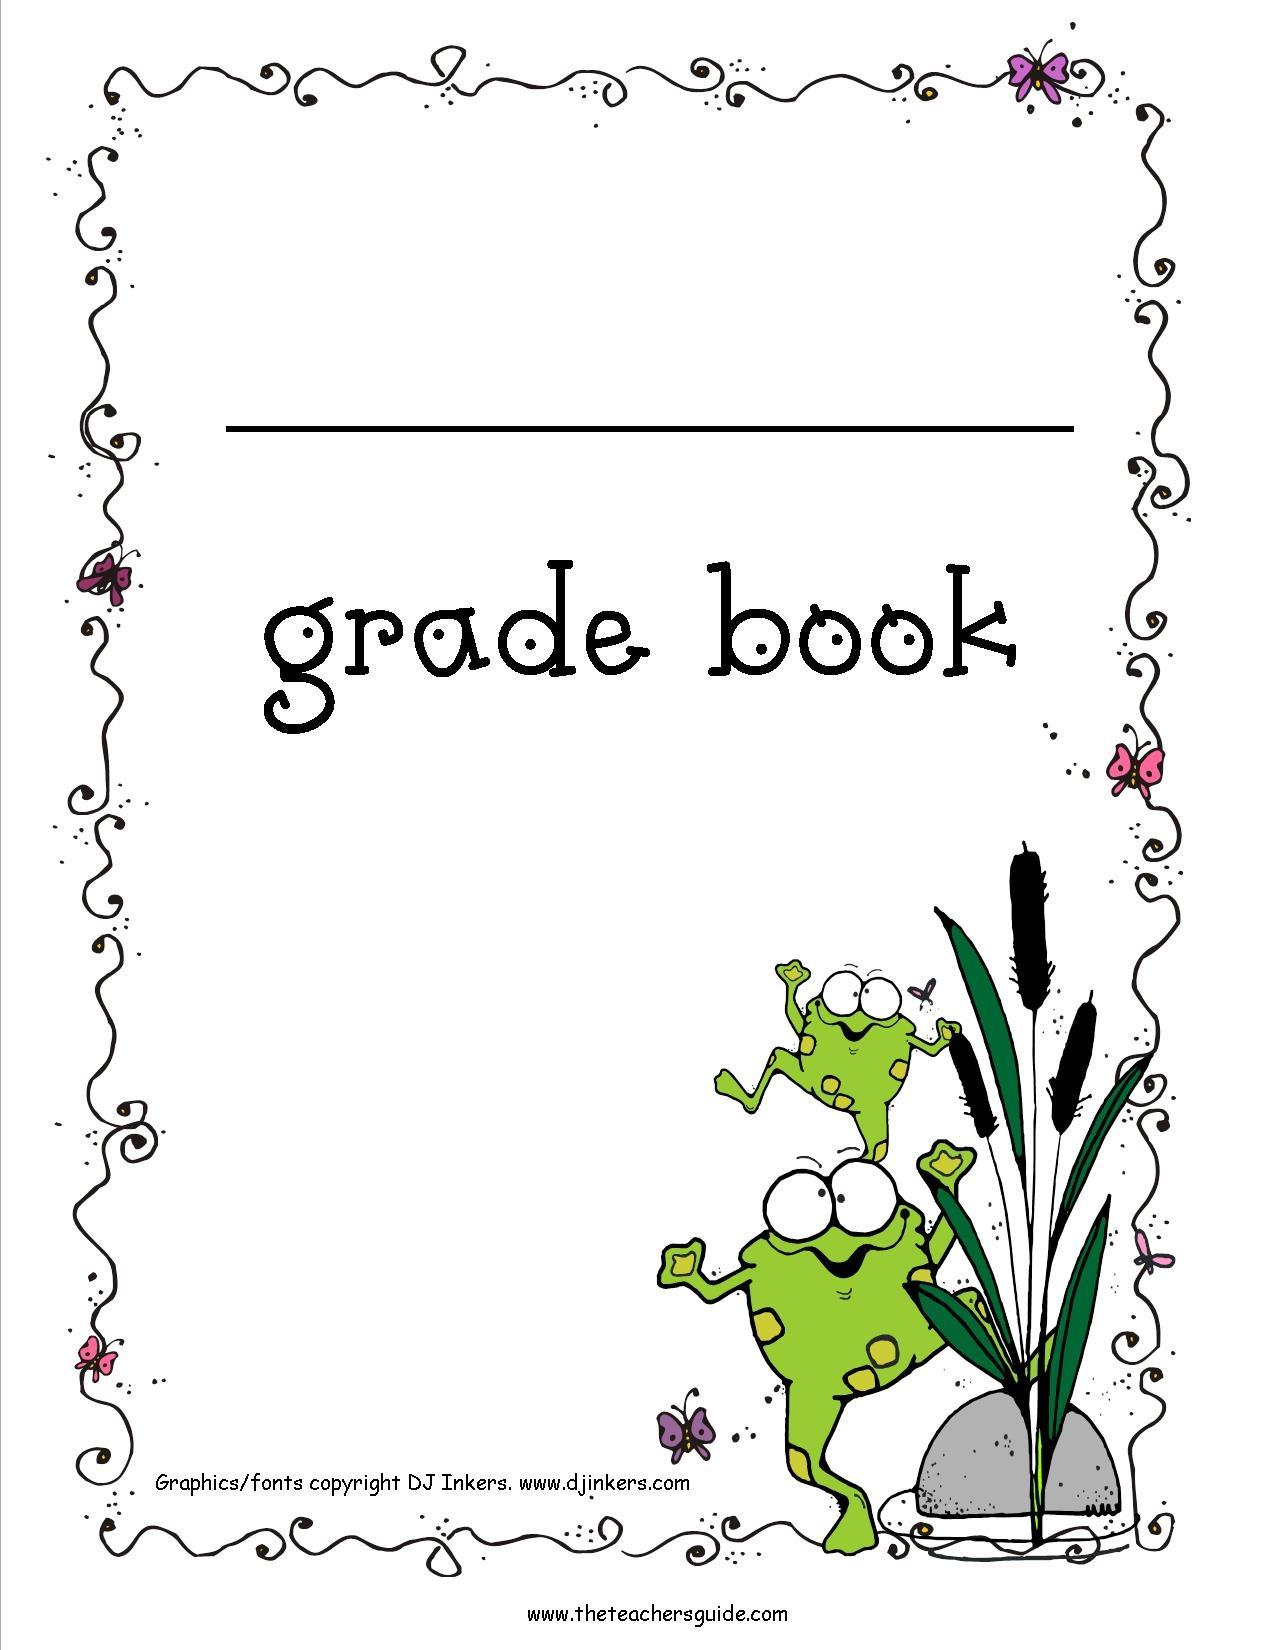 Free Printable Grade Books - Free Printable Gradebook